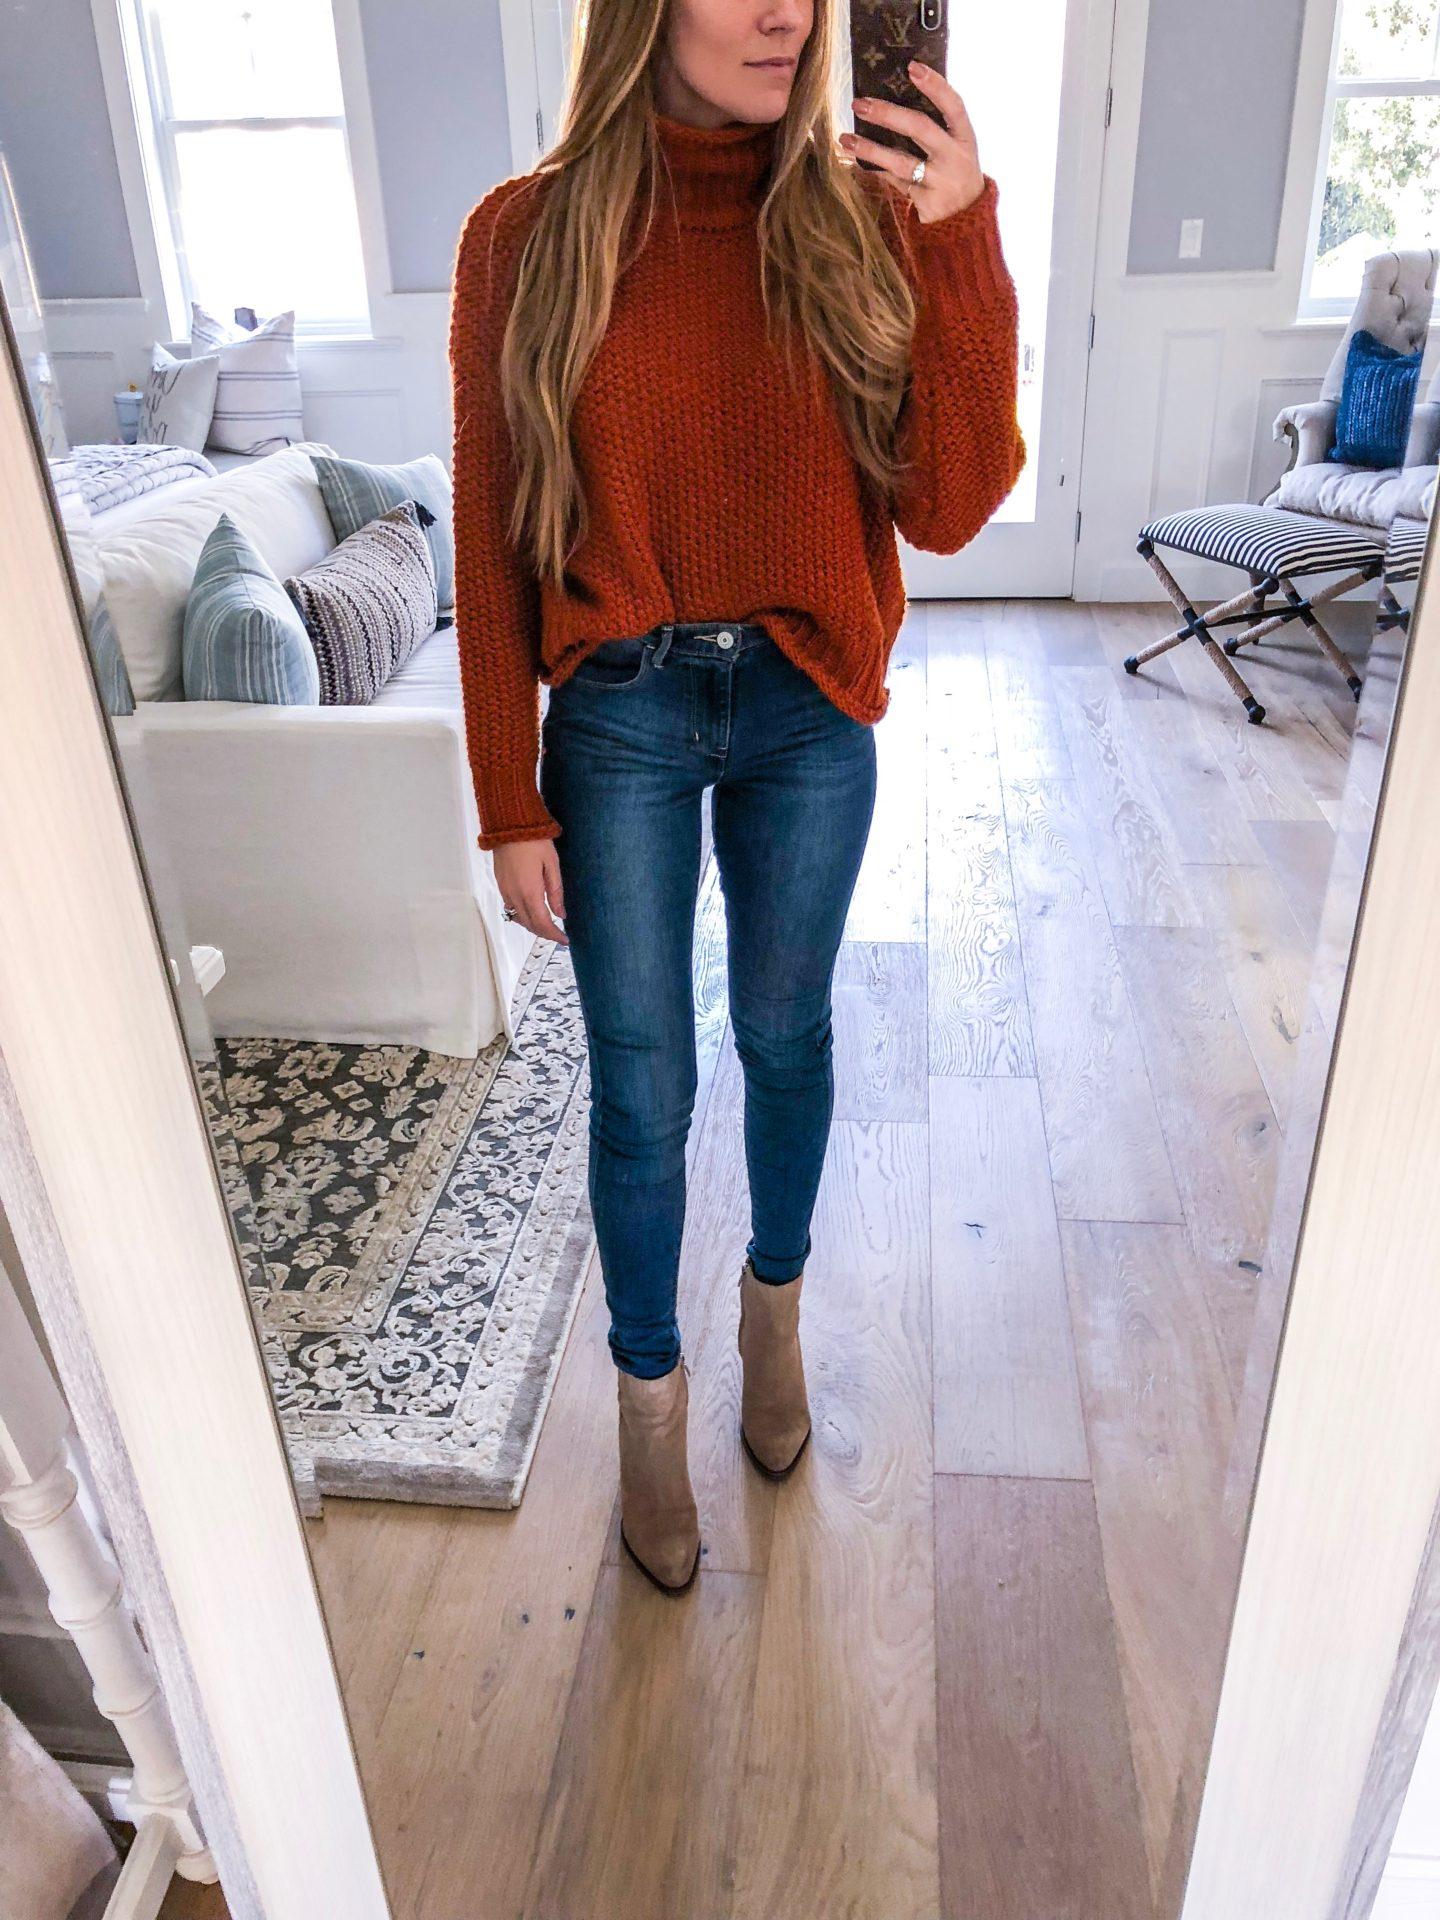 5 Ways to Style Skinny Jeans